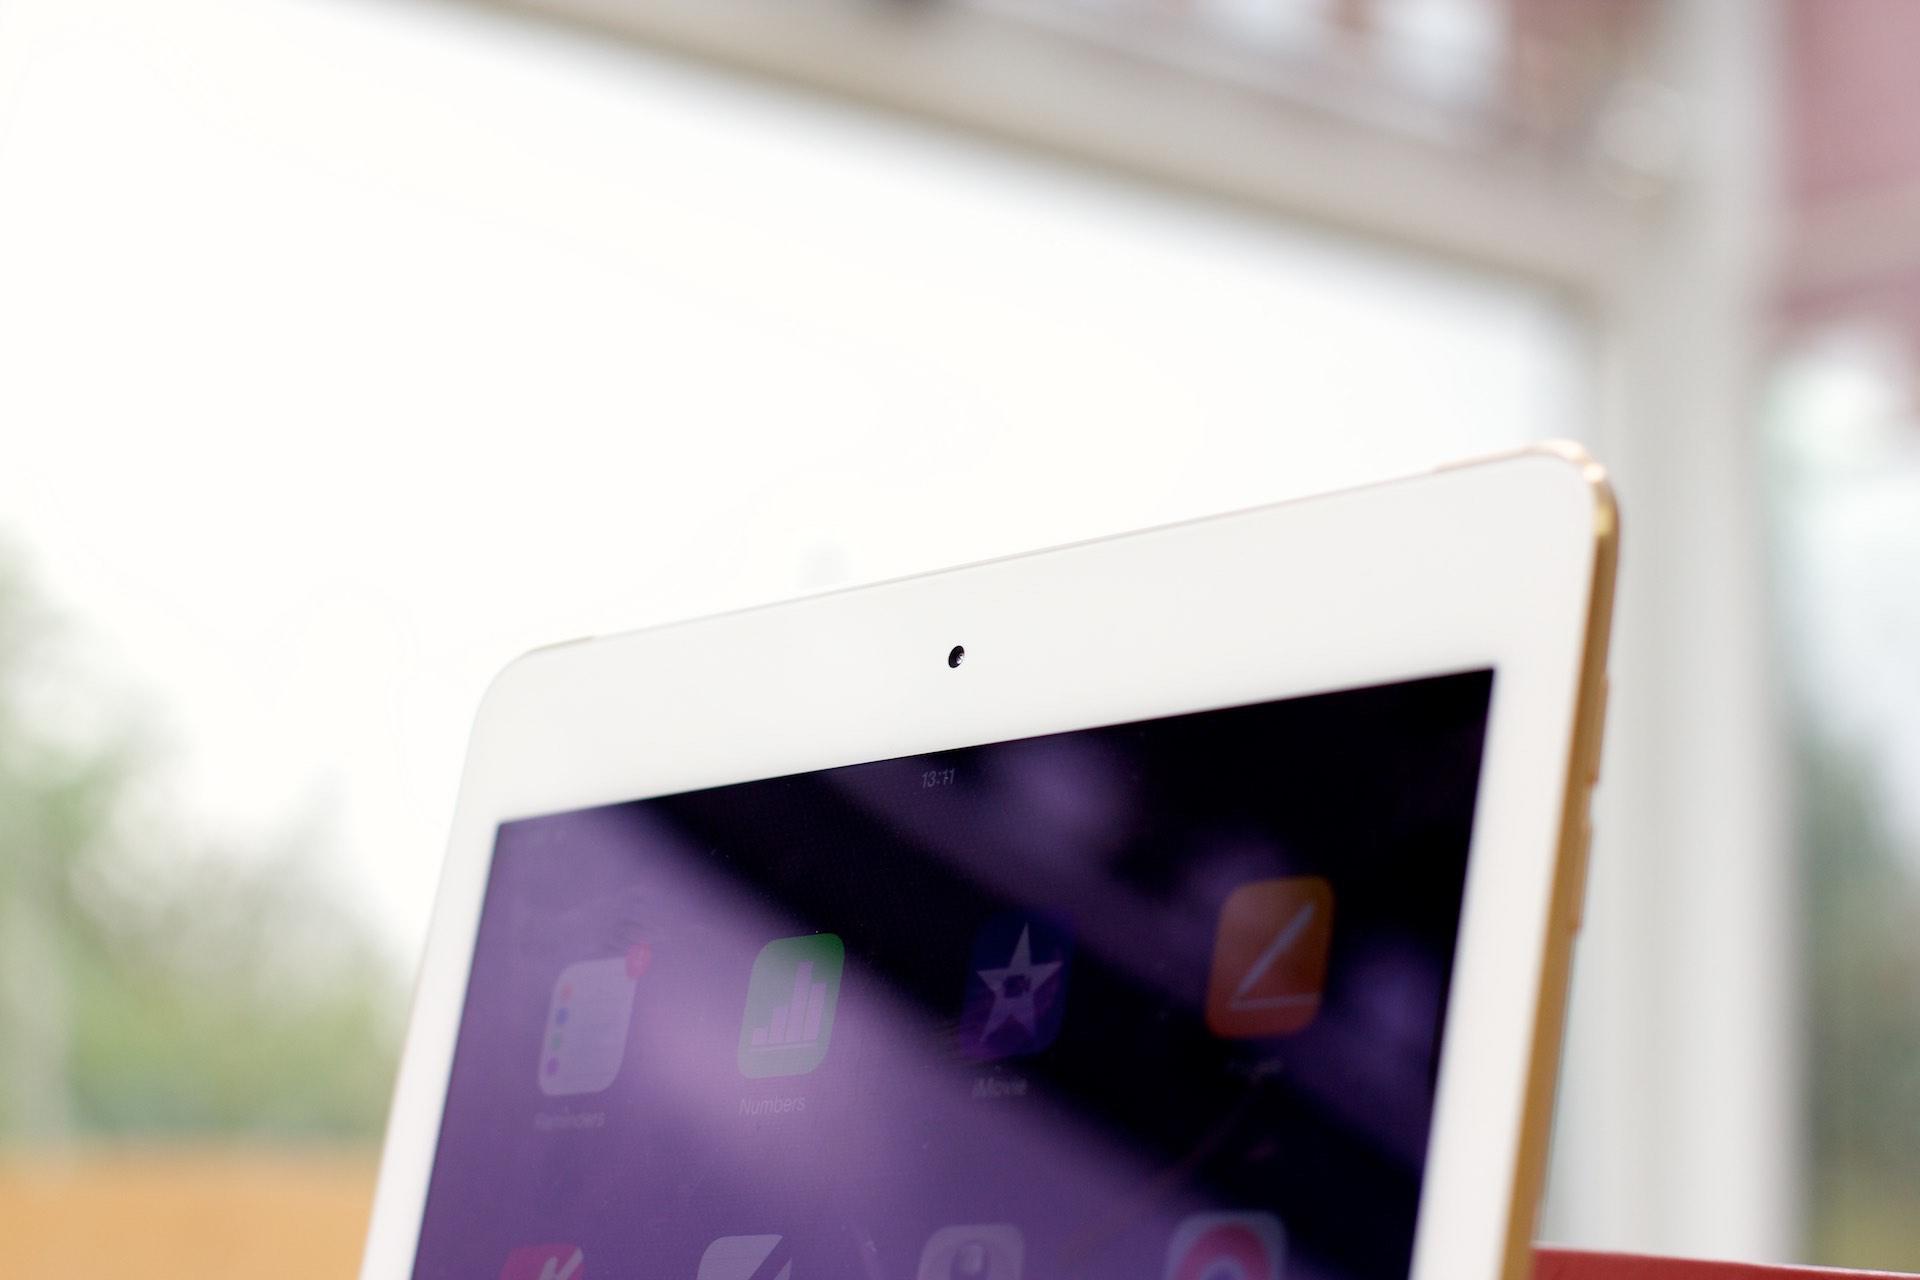 apple-ipad-air-2-review 5.jpg